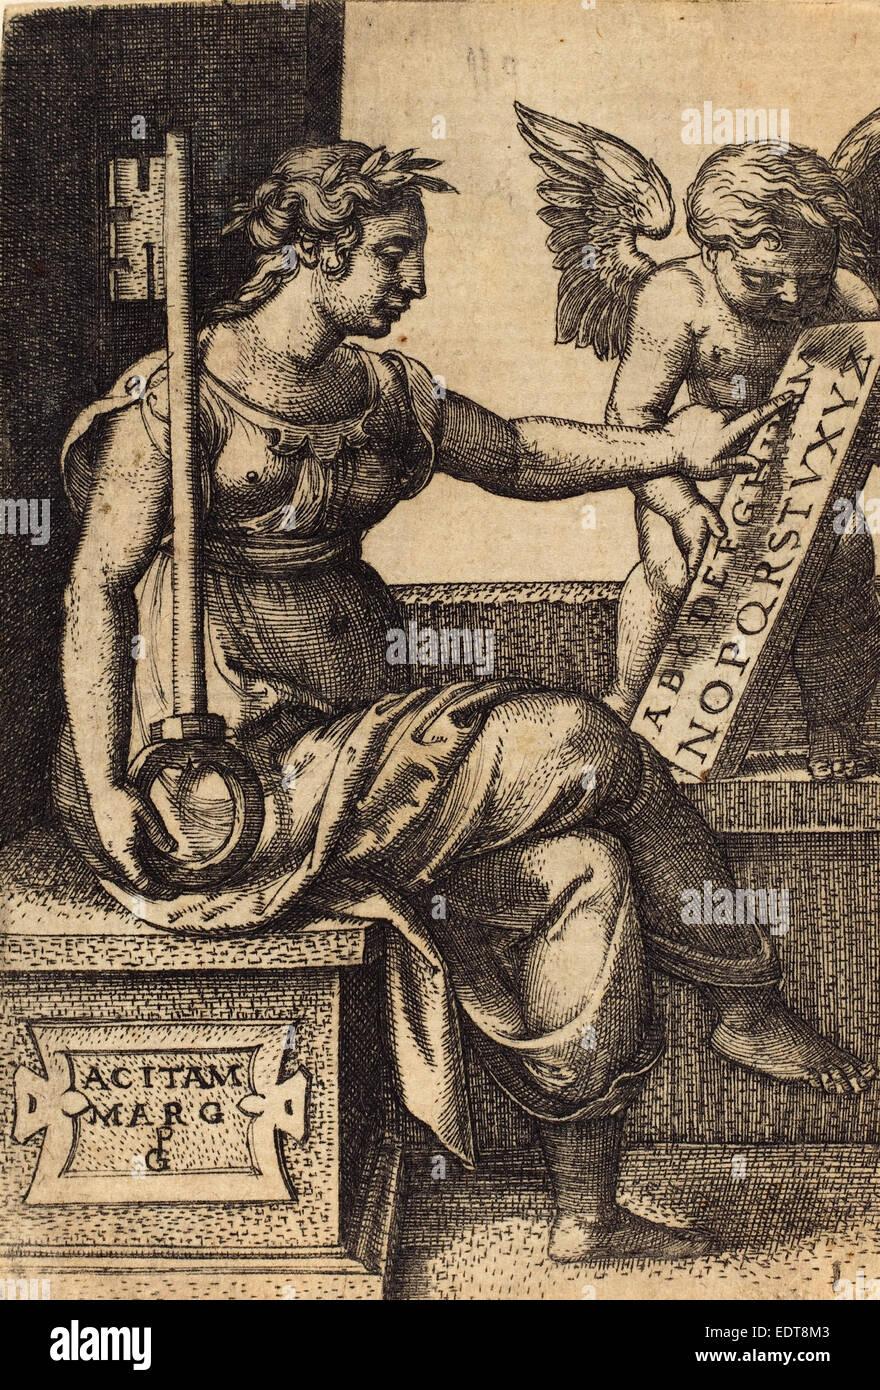 Georg Pencz (German, c. 1500 - 1550), Grammar, engraving - Stock Image